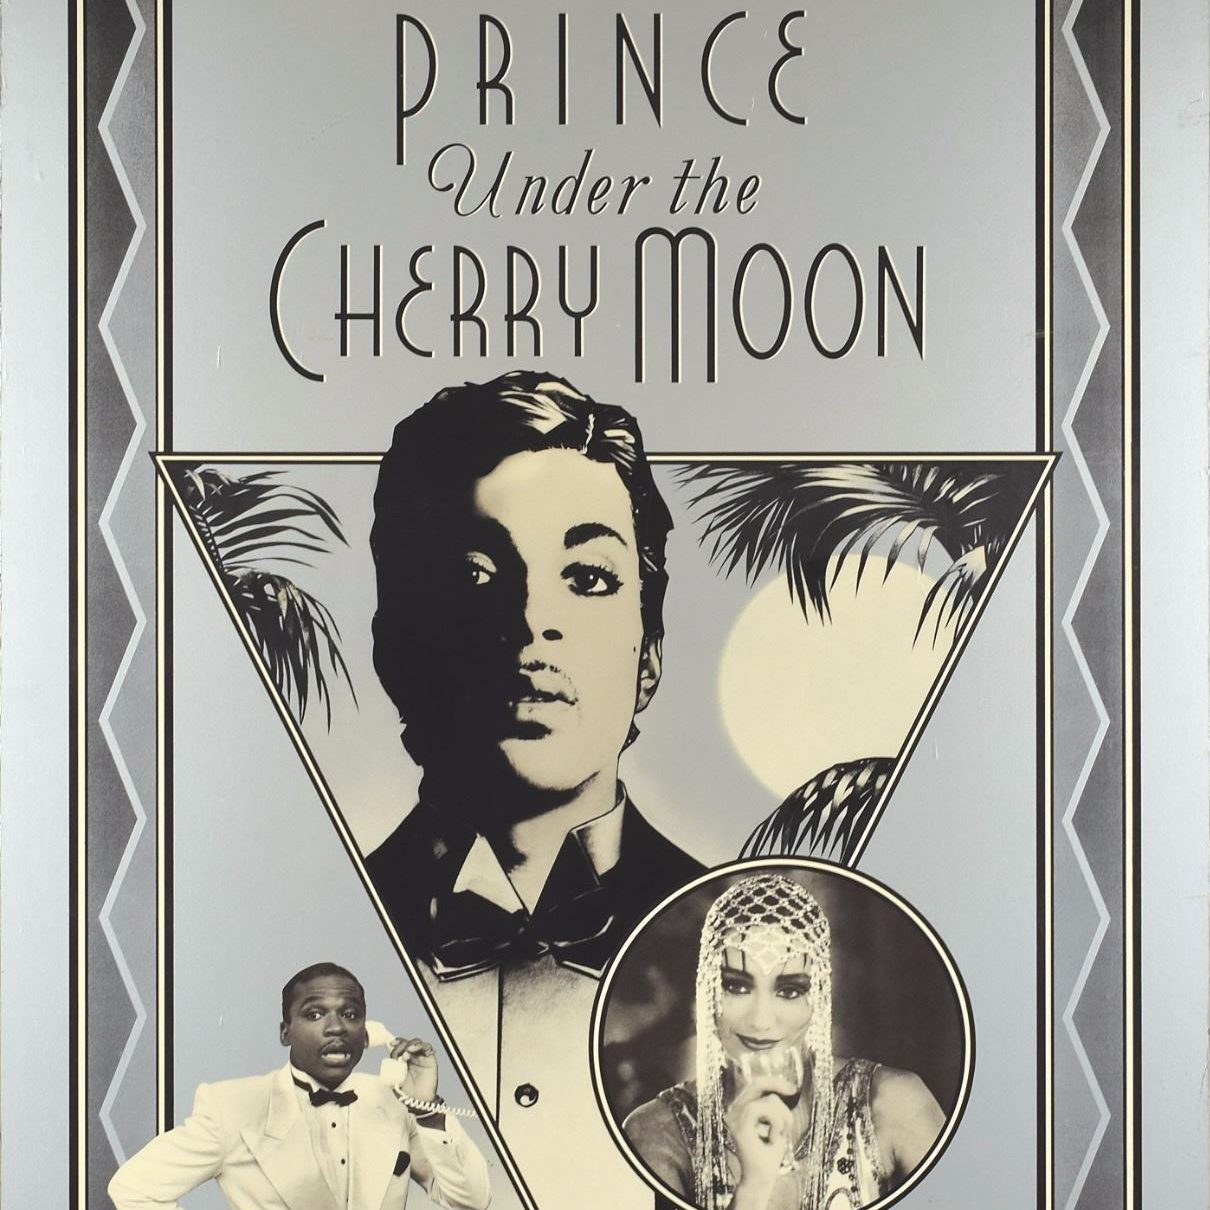 MV5BM2NlM2Y5NDMtN2MwNC00MmY4LTg1MWUtMmE3MjgyZDEwMjI2XkEyXkFqcGdeQXVyNjMwMjk0MTQ@. V1 e1578671930326 Let's Go Crazy With 20 Facts About Prince's Movie Purple Rain